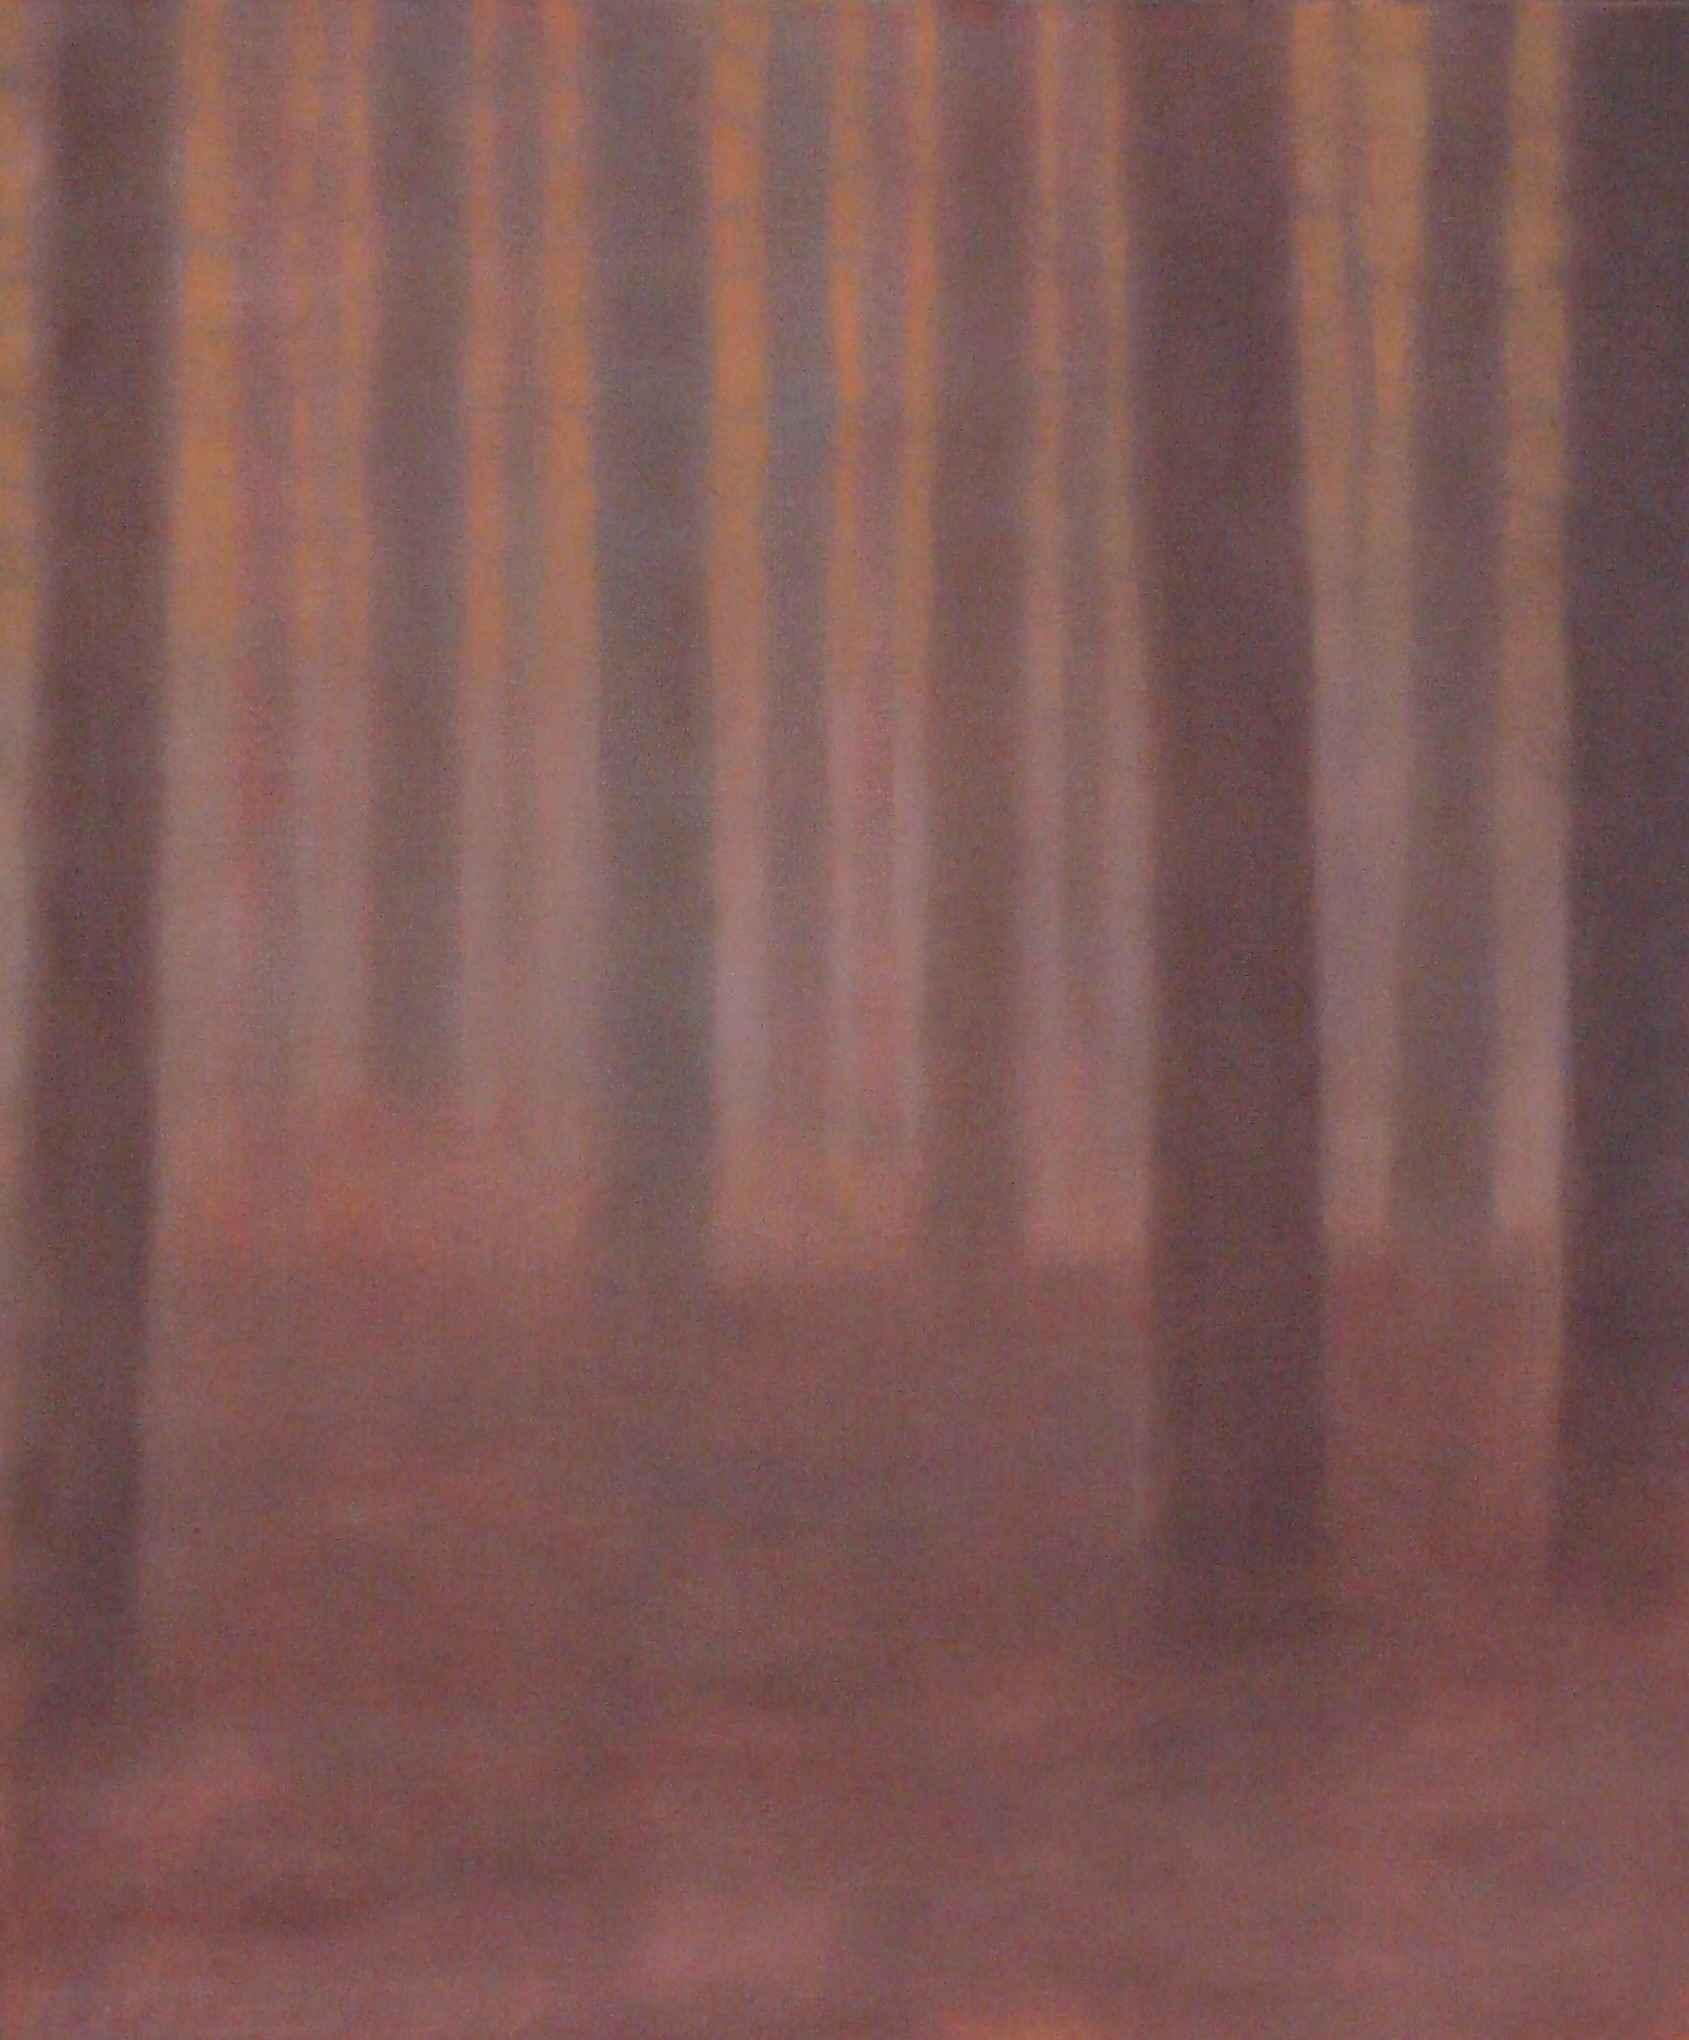 Before Night by Ms. Margaret Lockwood - Masterpiece Online